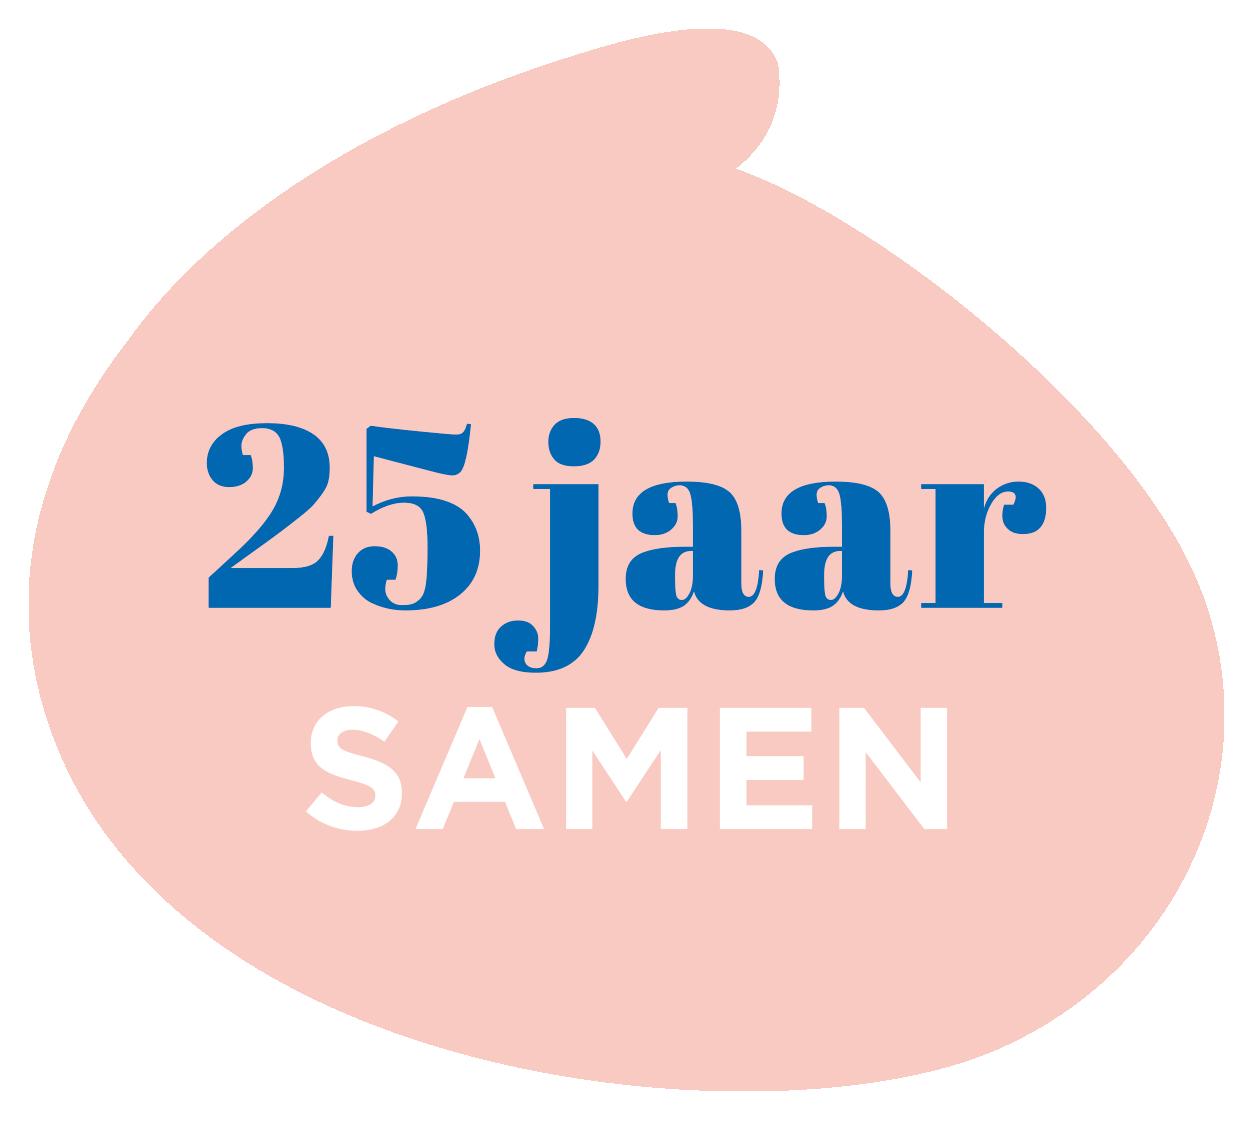 Macaron 25 years